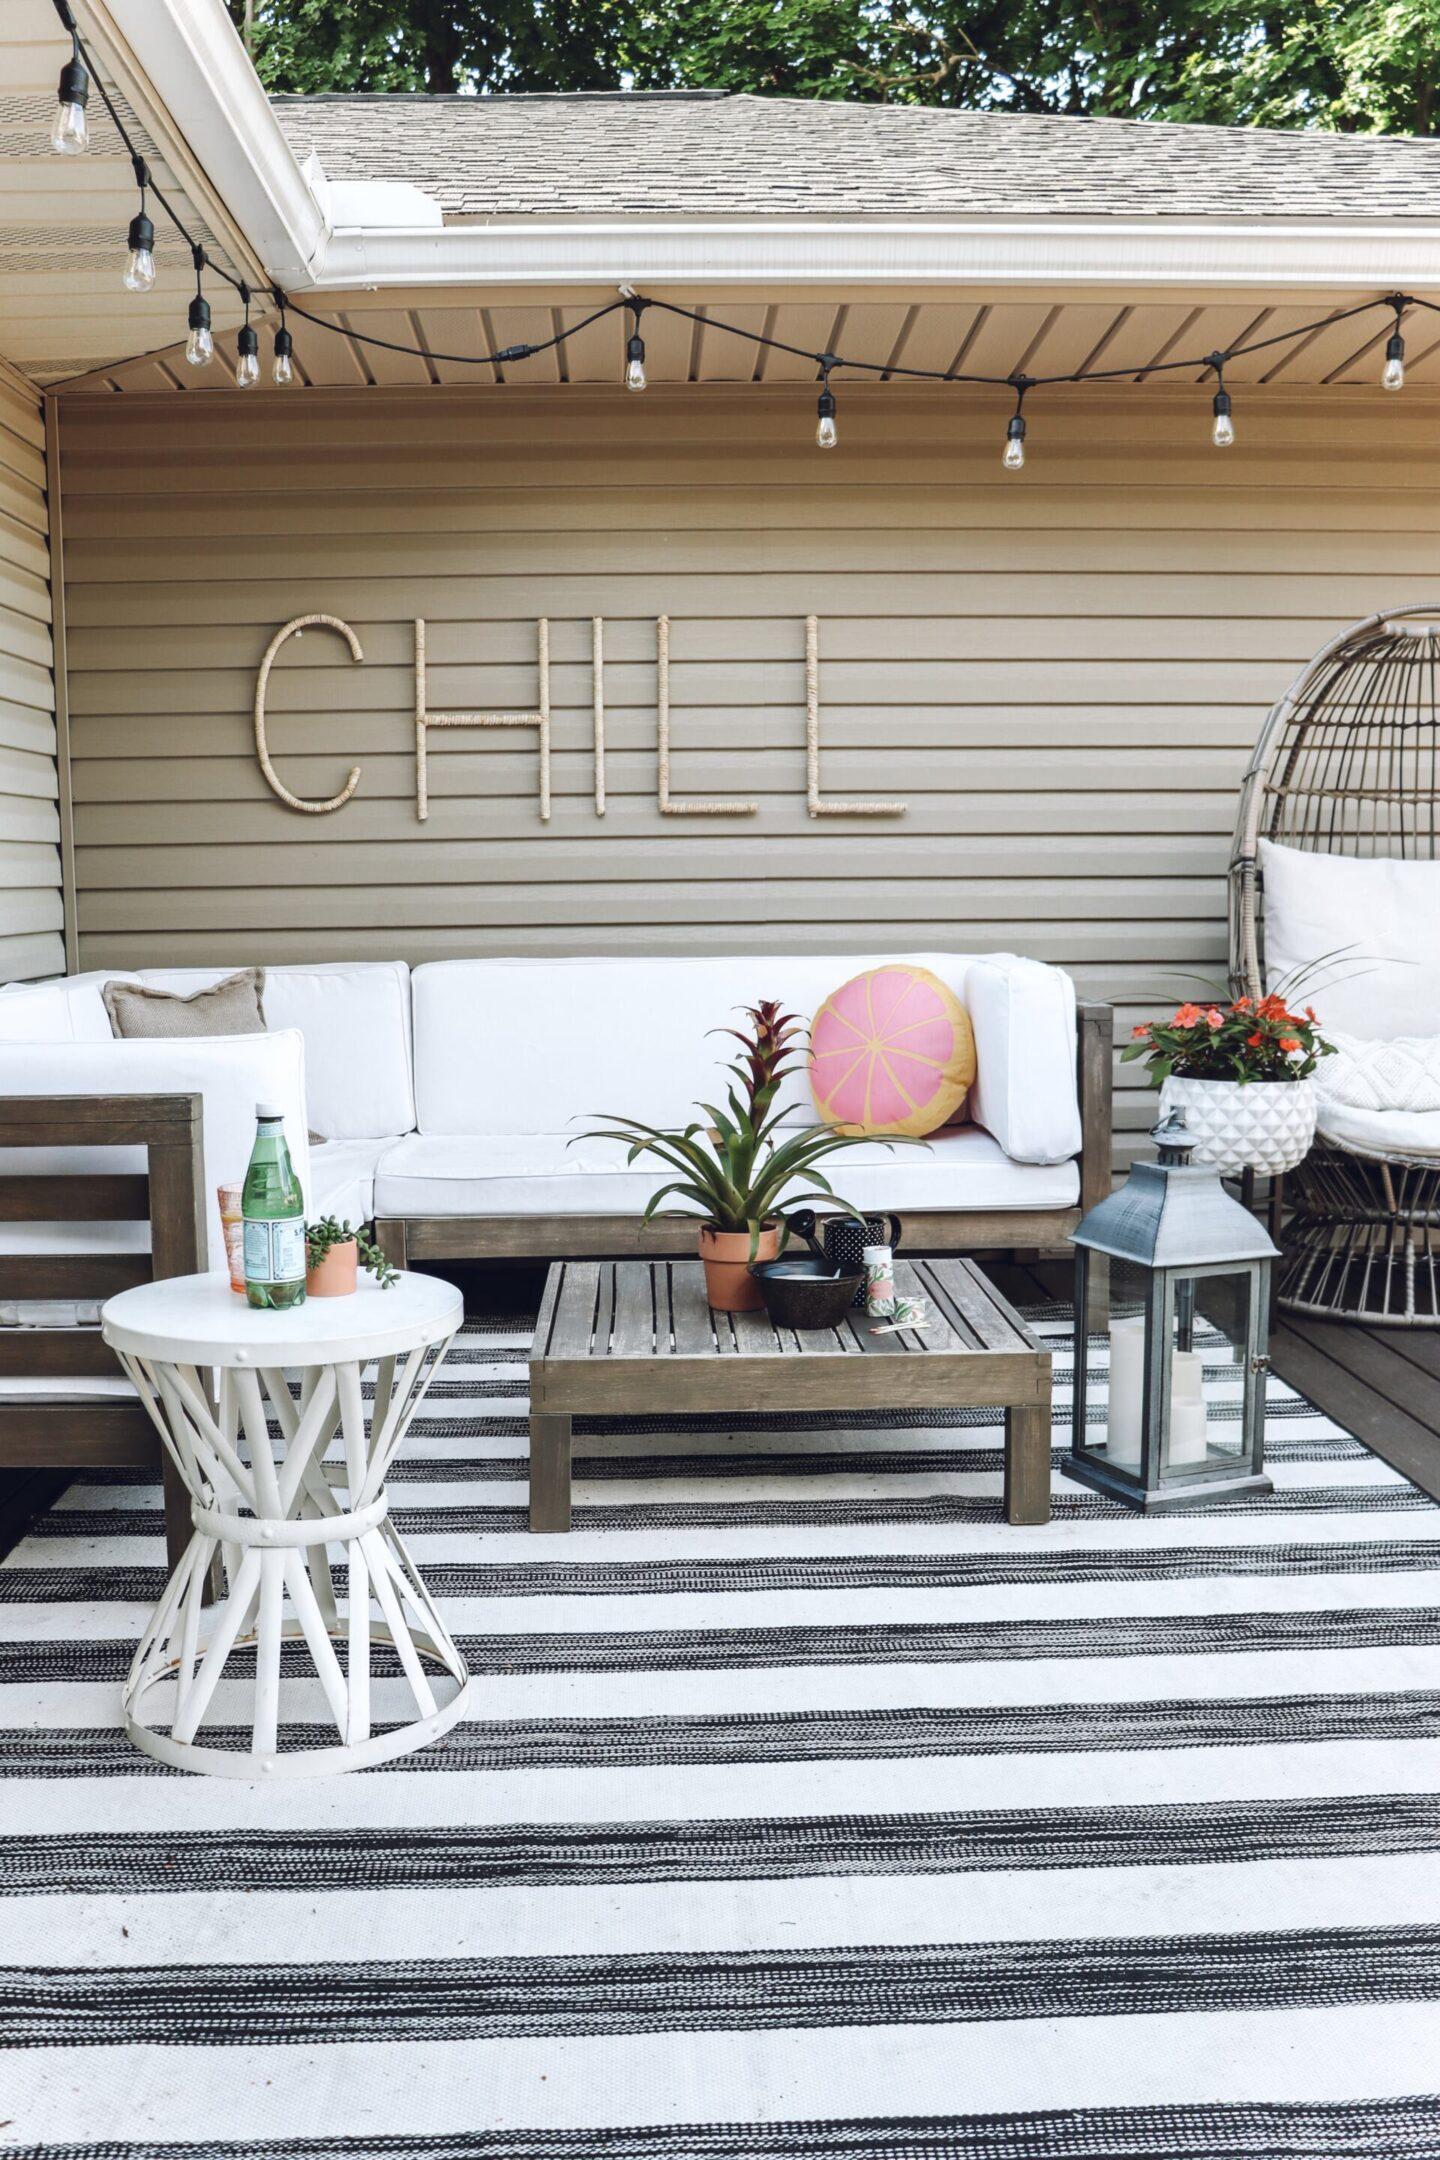 Deck decor